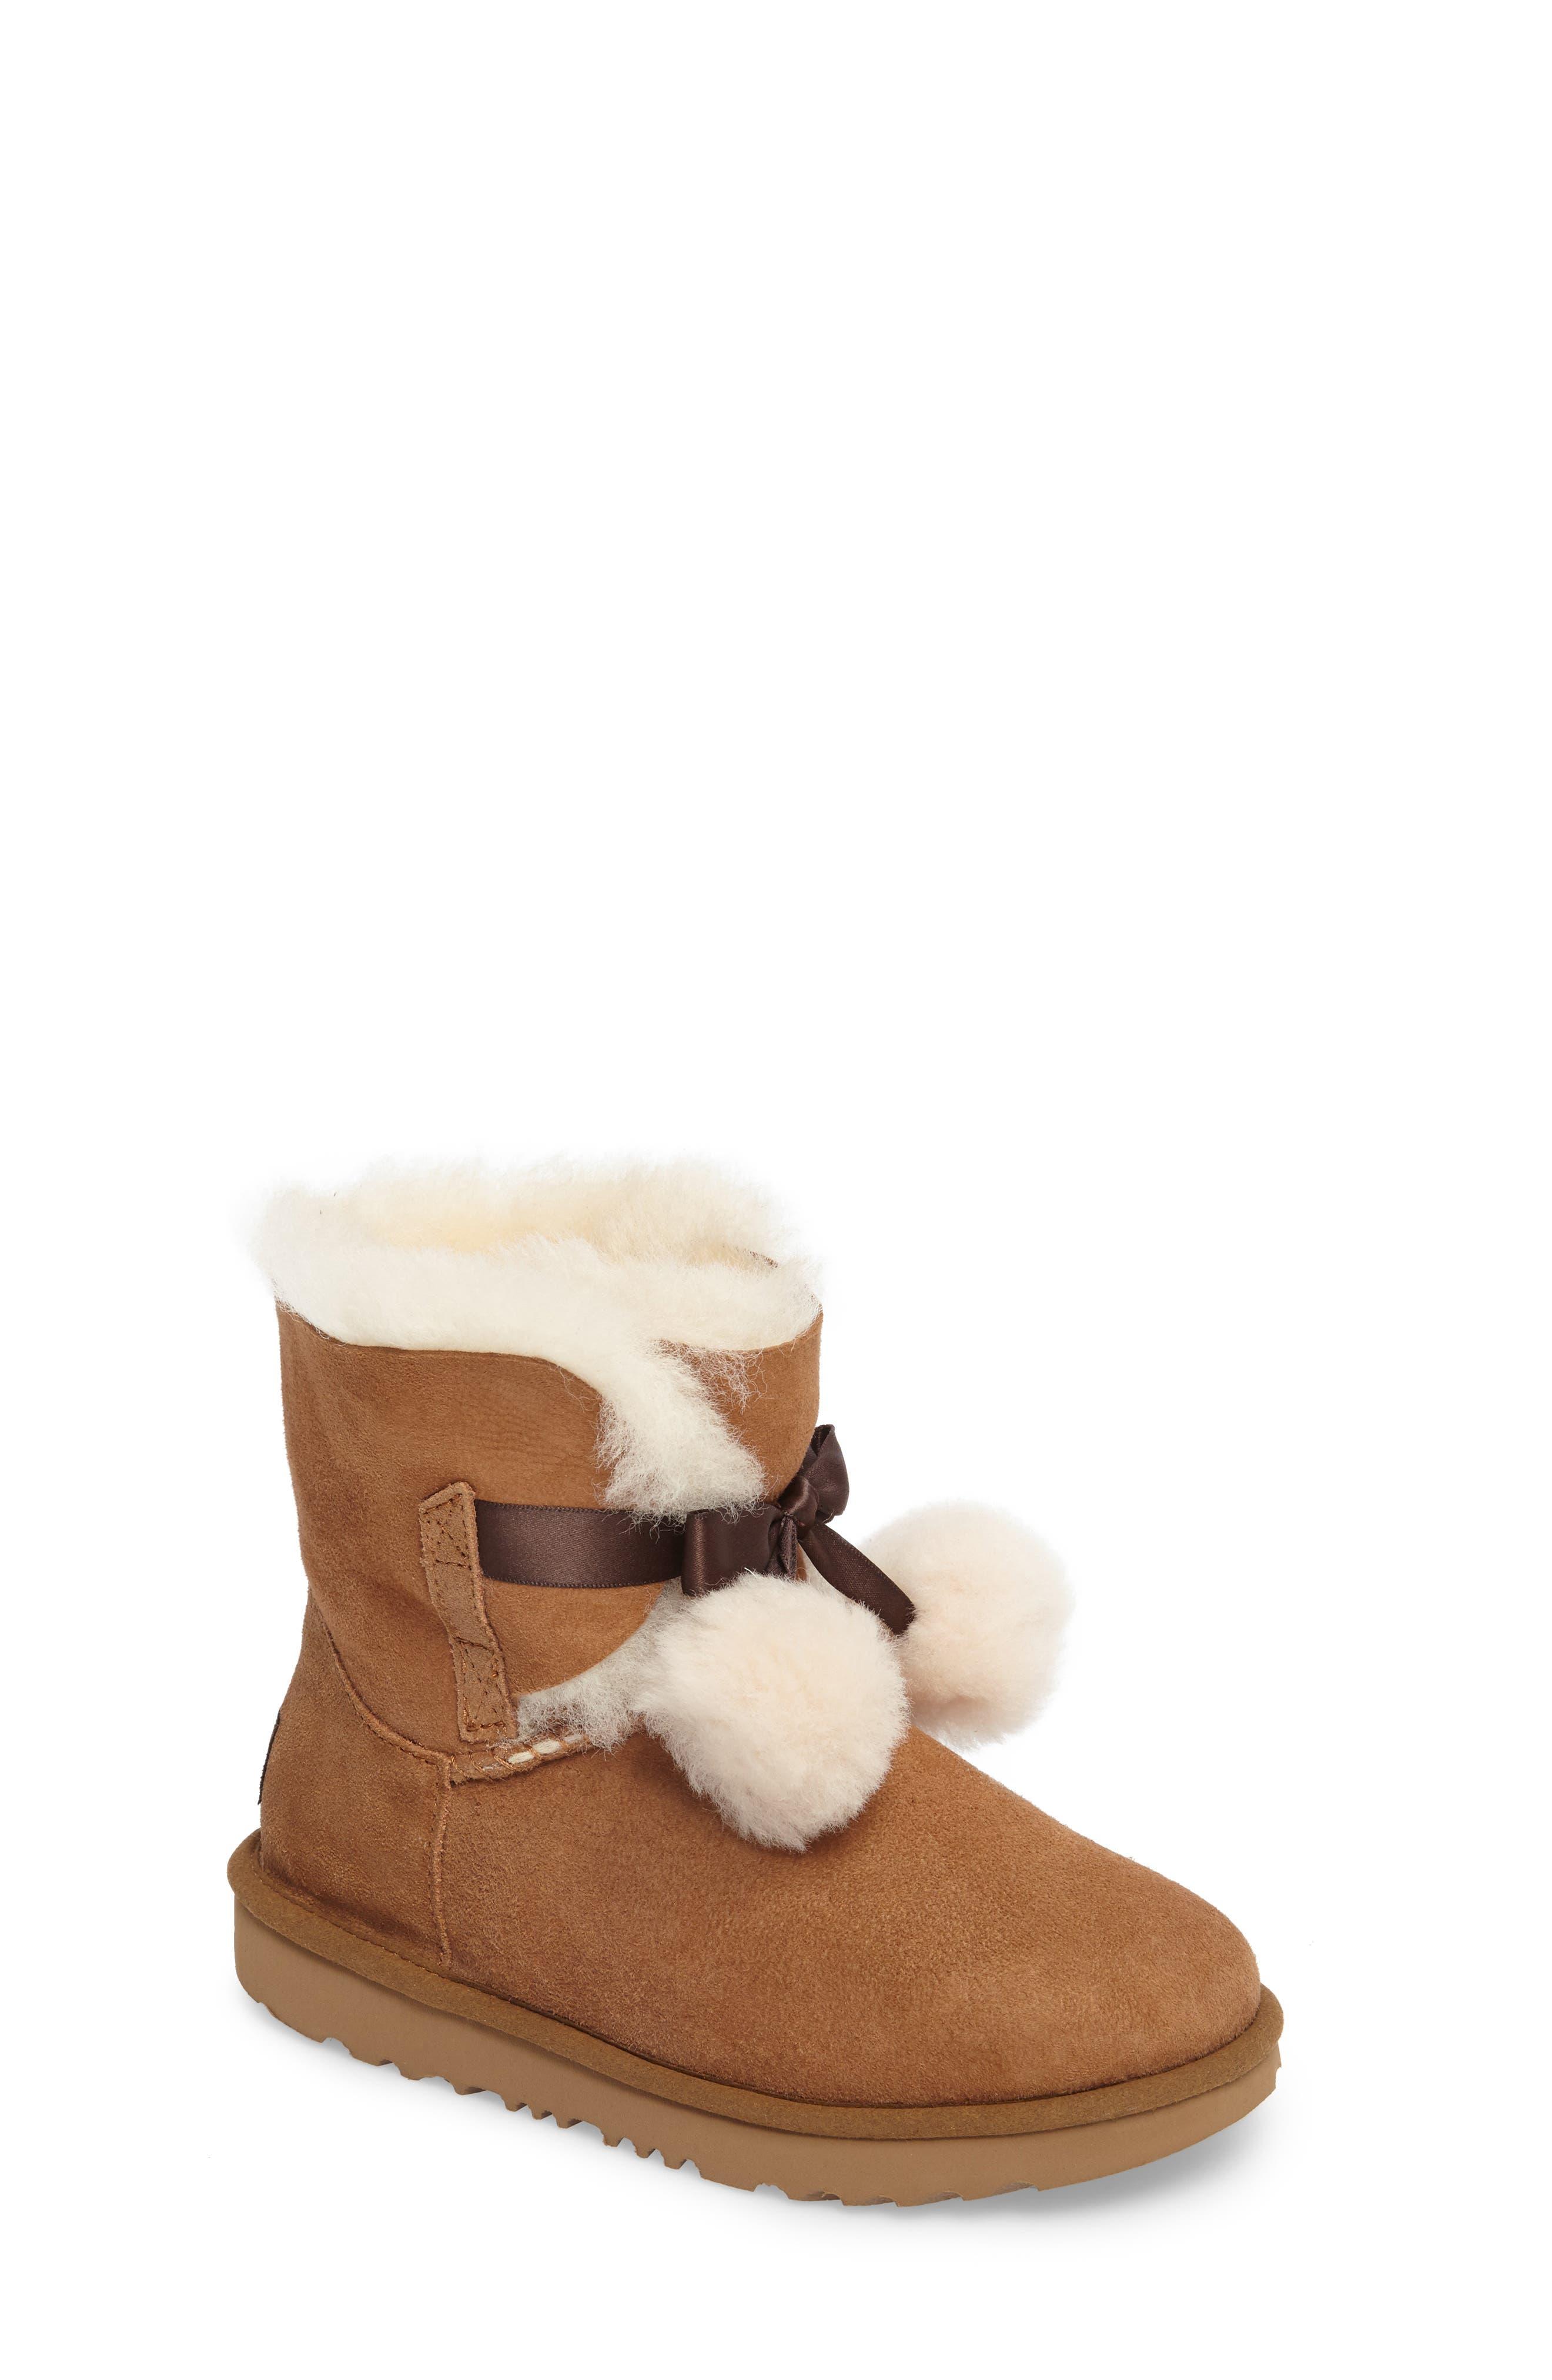 Girls Ugg Gita WaterResistant Genuine Shearling Pom Boot Size 4 M  Brown